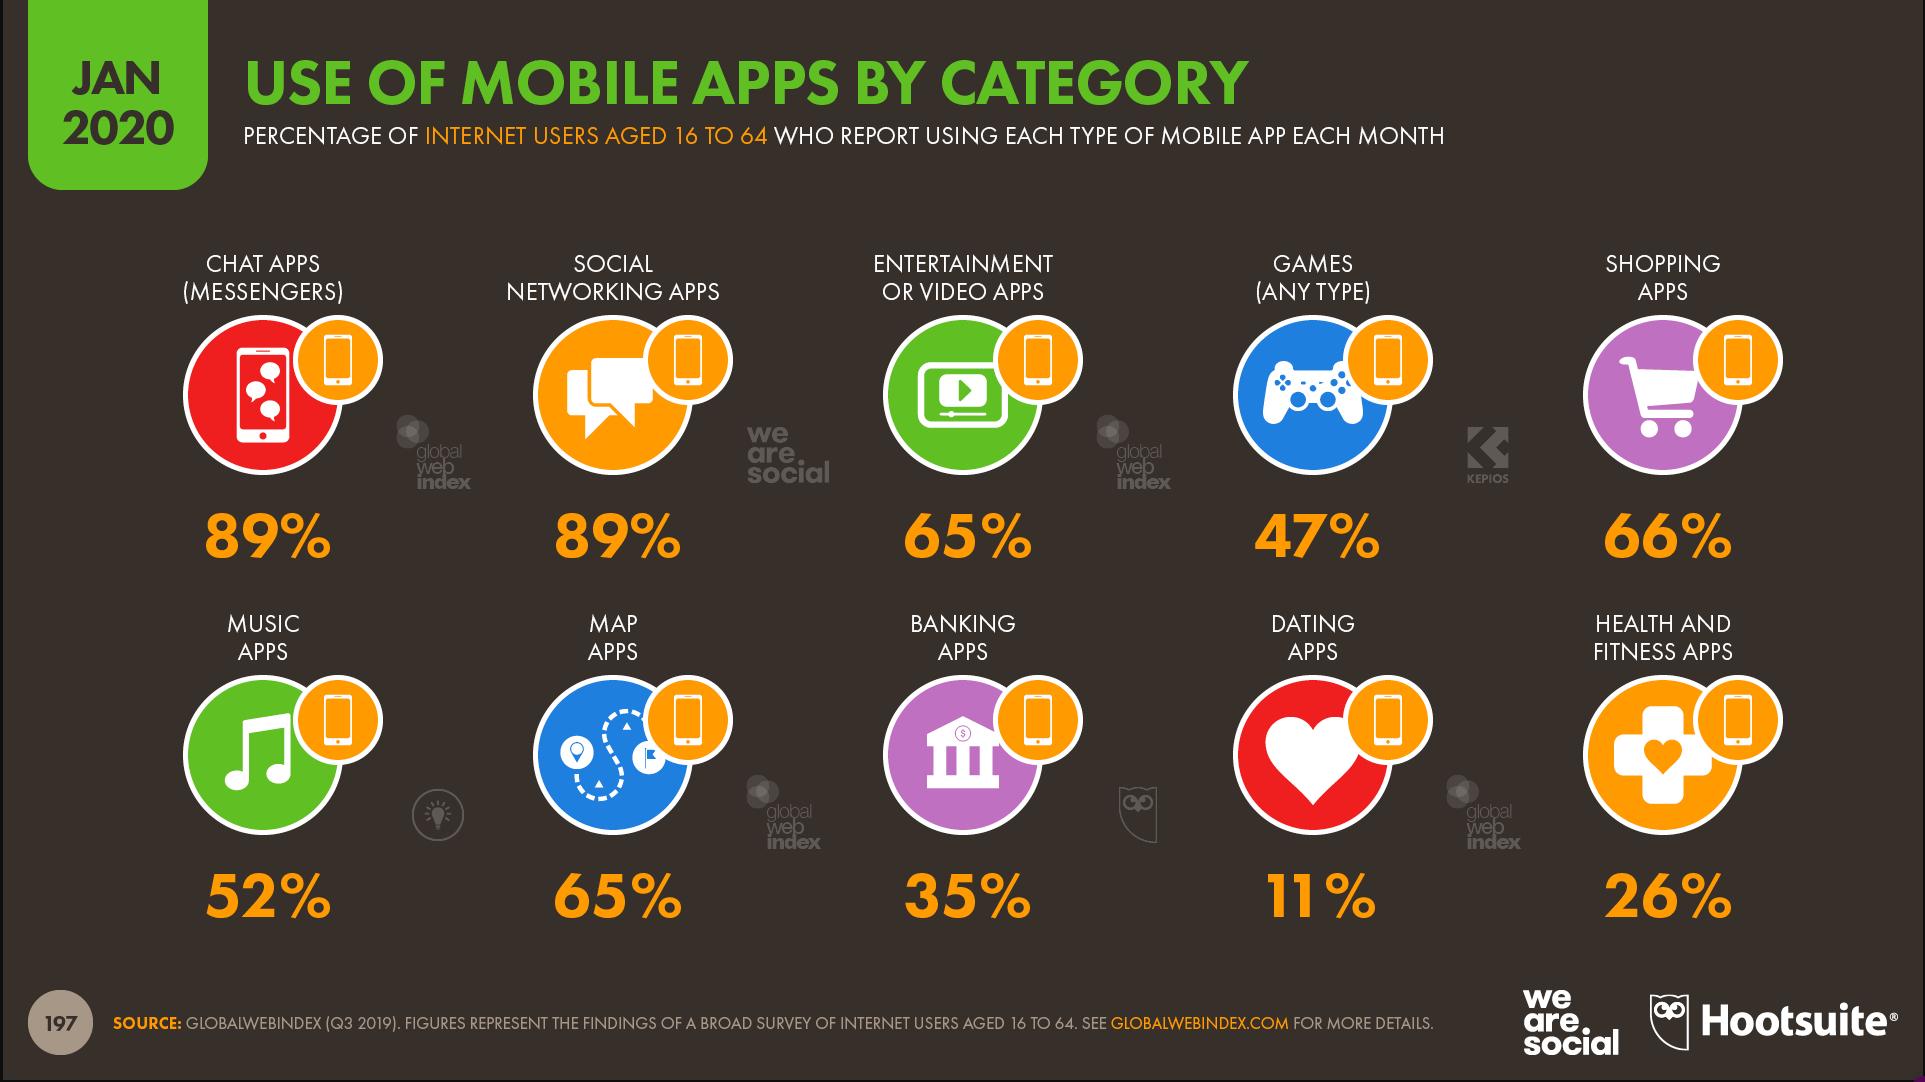 Digital 2020 Nutzung mobile Apps nach Kategorie